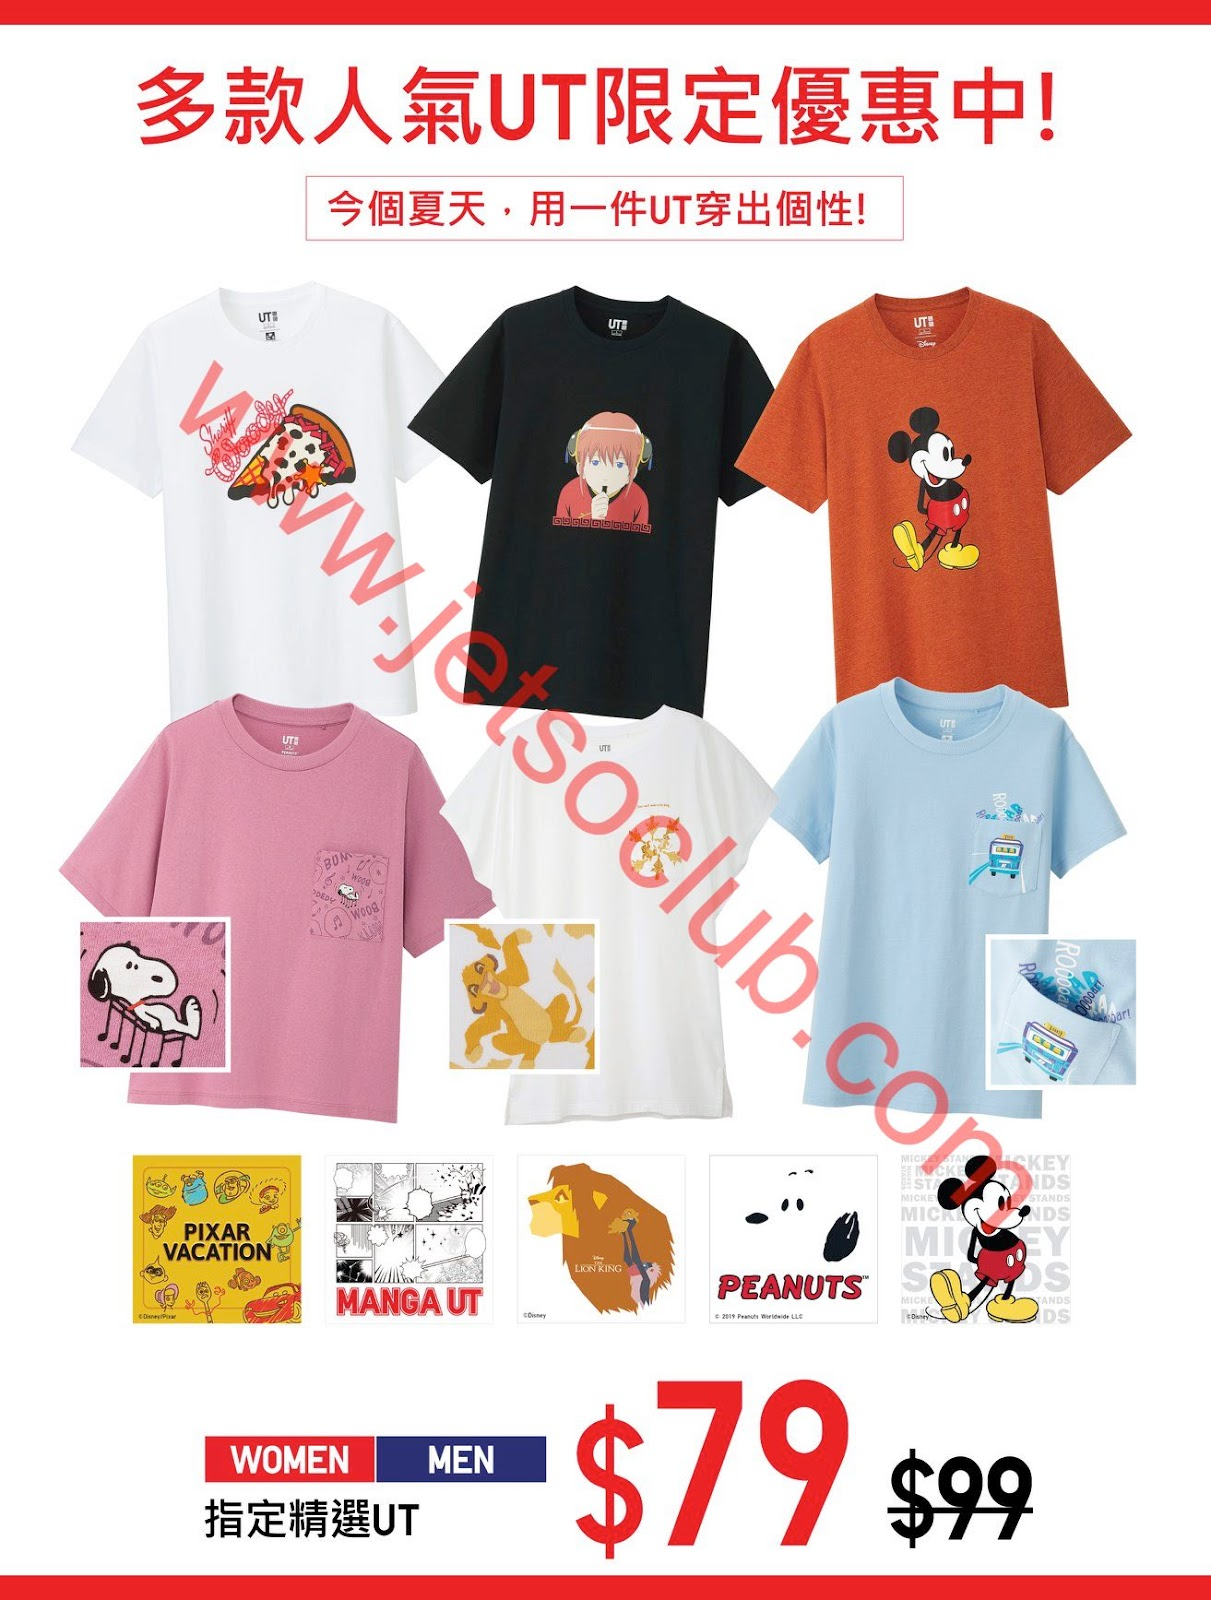 Uniqlo:最新優惠 / One Piece Stampede UT系列 現已全店發售(27/7) ( Jetso Club 著數俱樂部 )